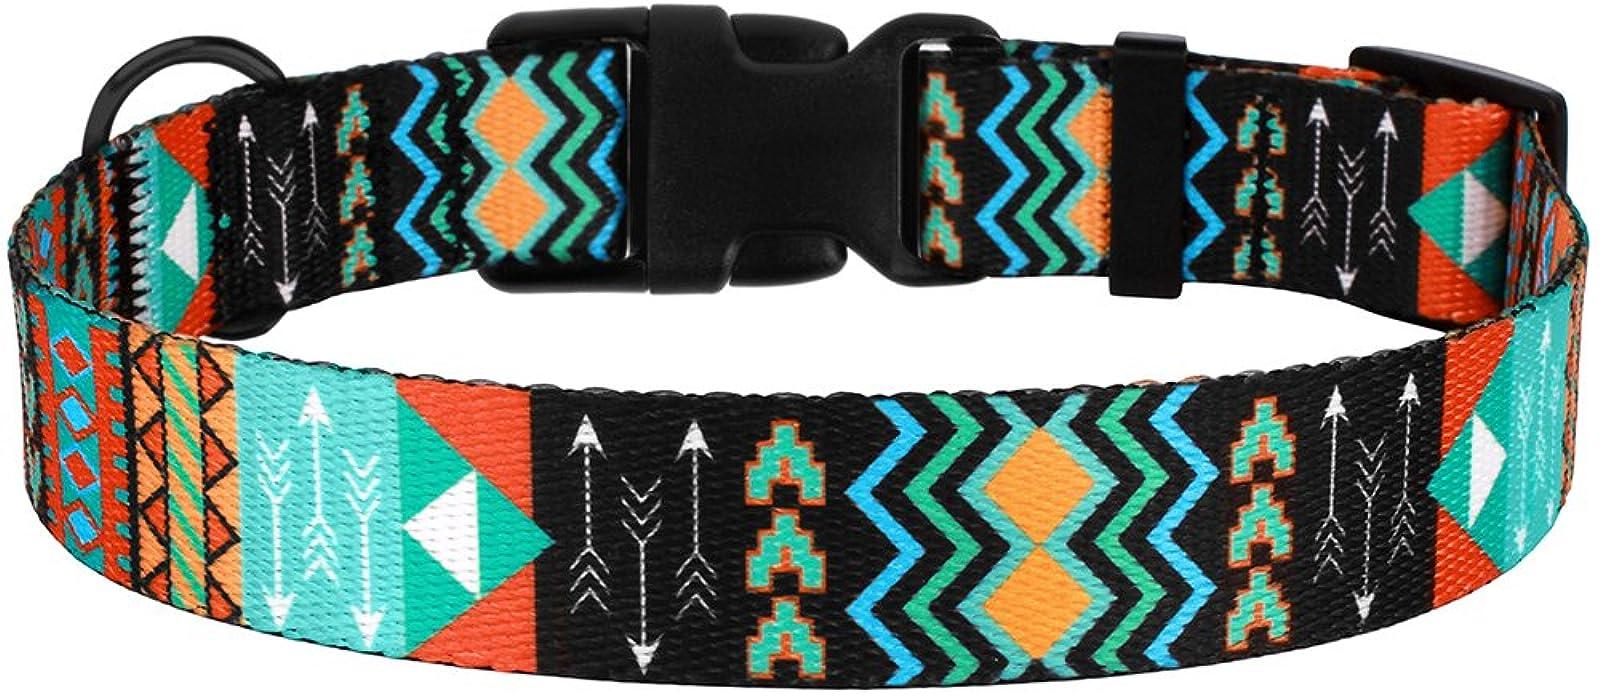 CollarDirect Nylon Dog Collar with Buckle Tribal - 4